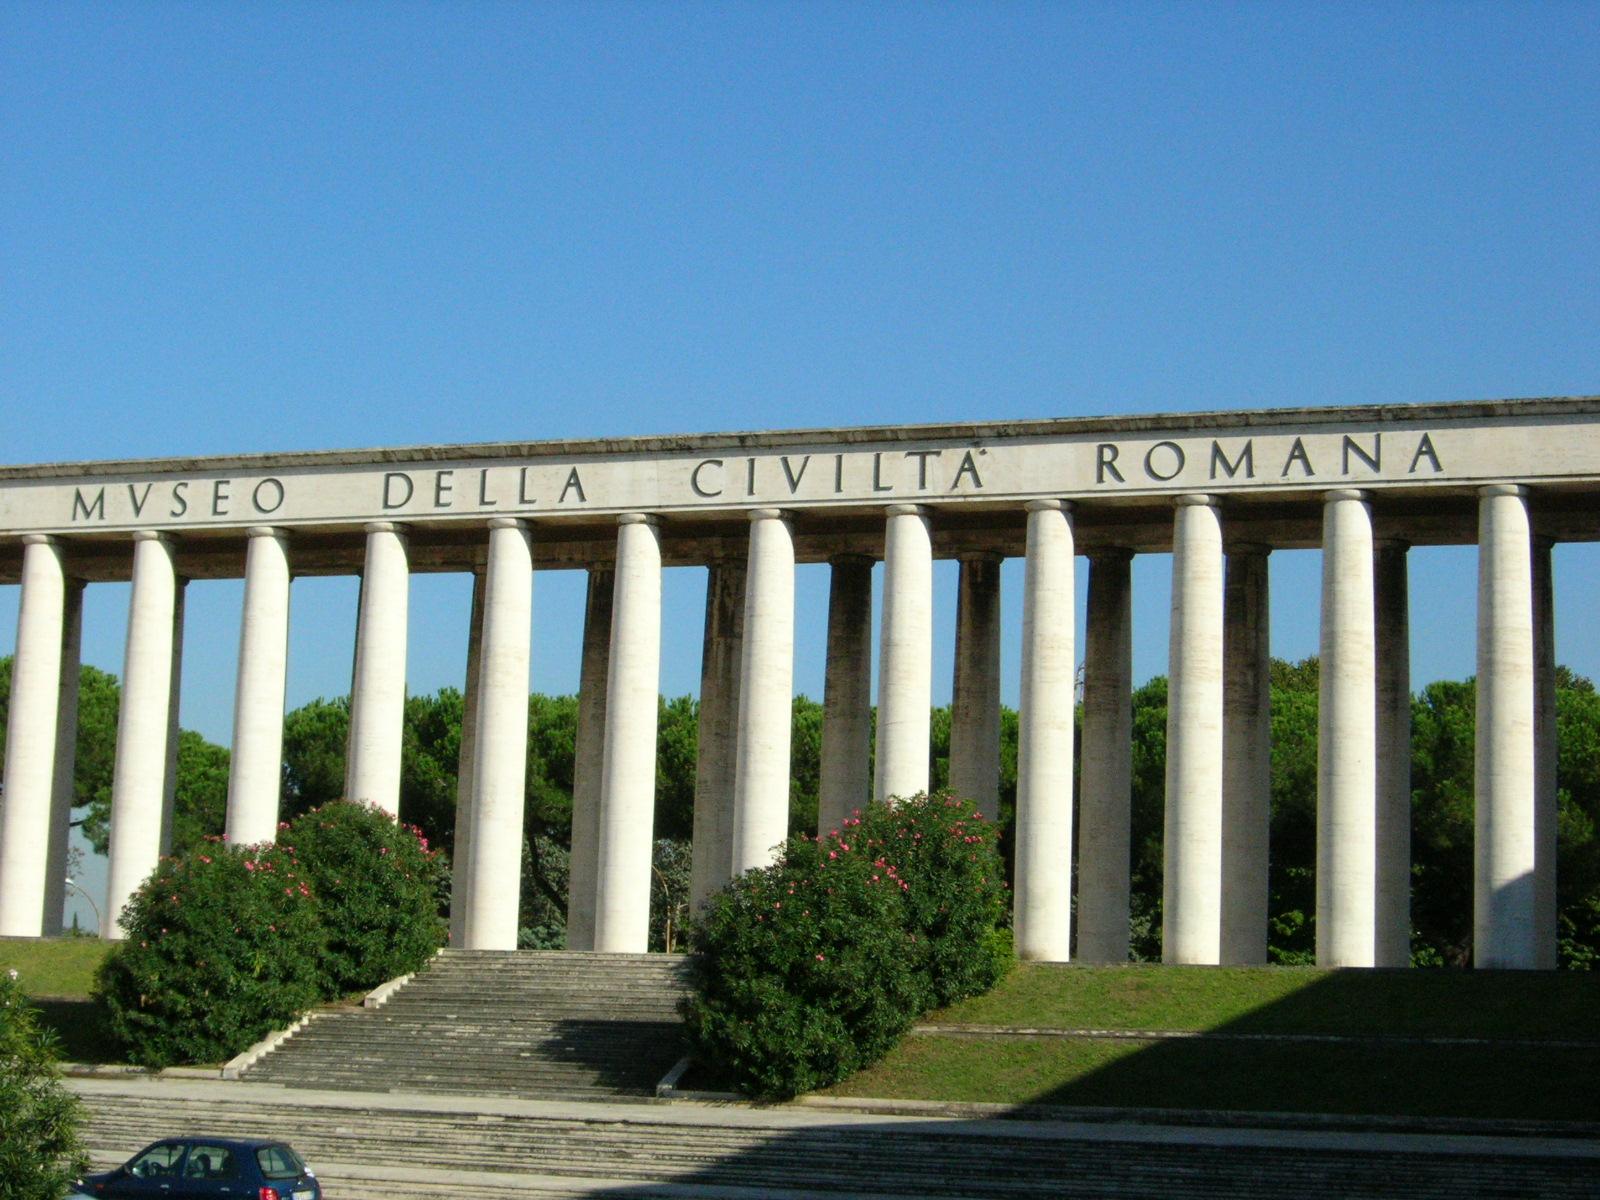 Музей римской цивилизации (Museo della Civiltà Romana)